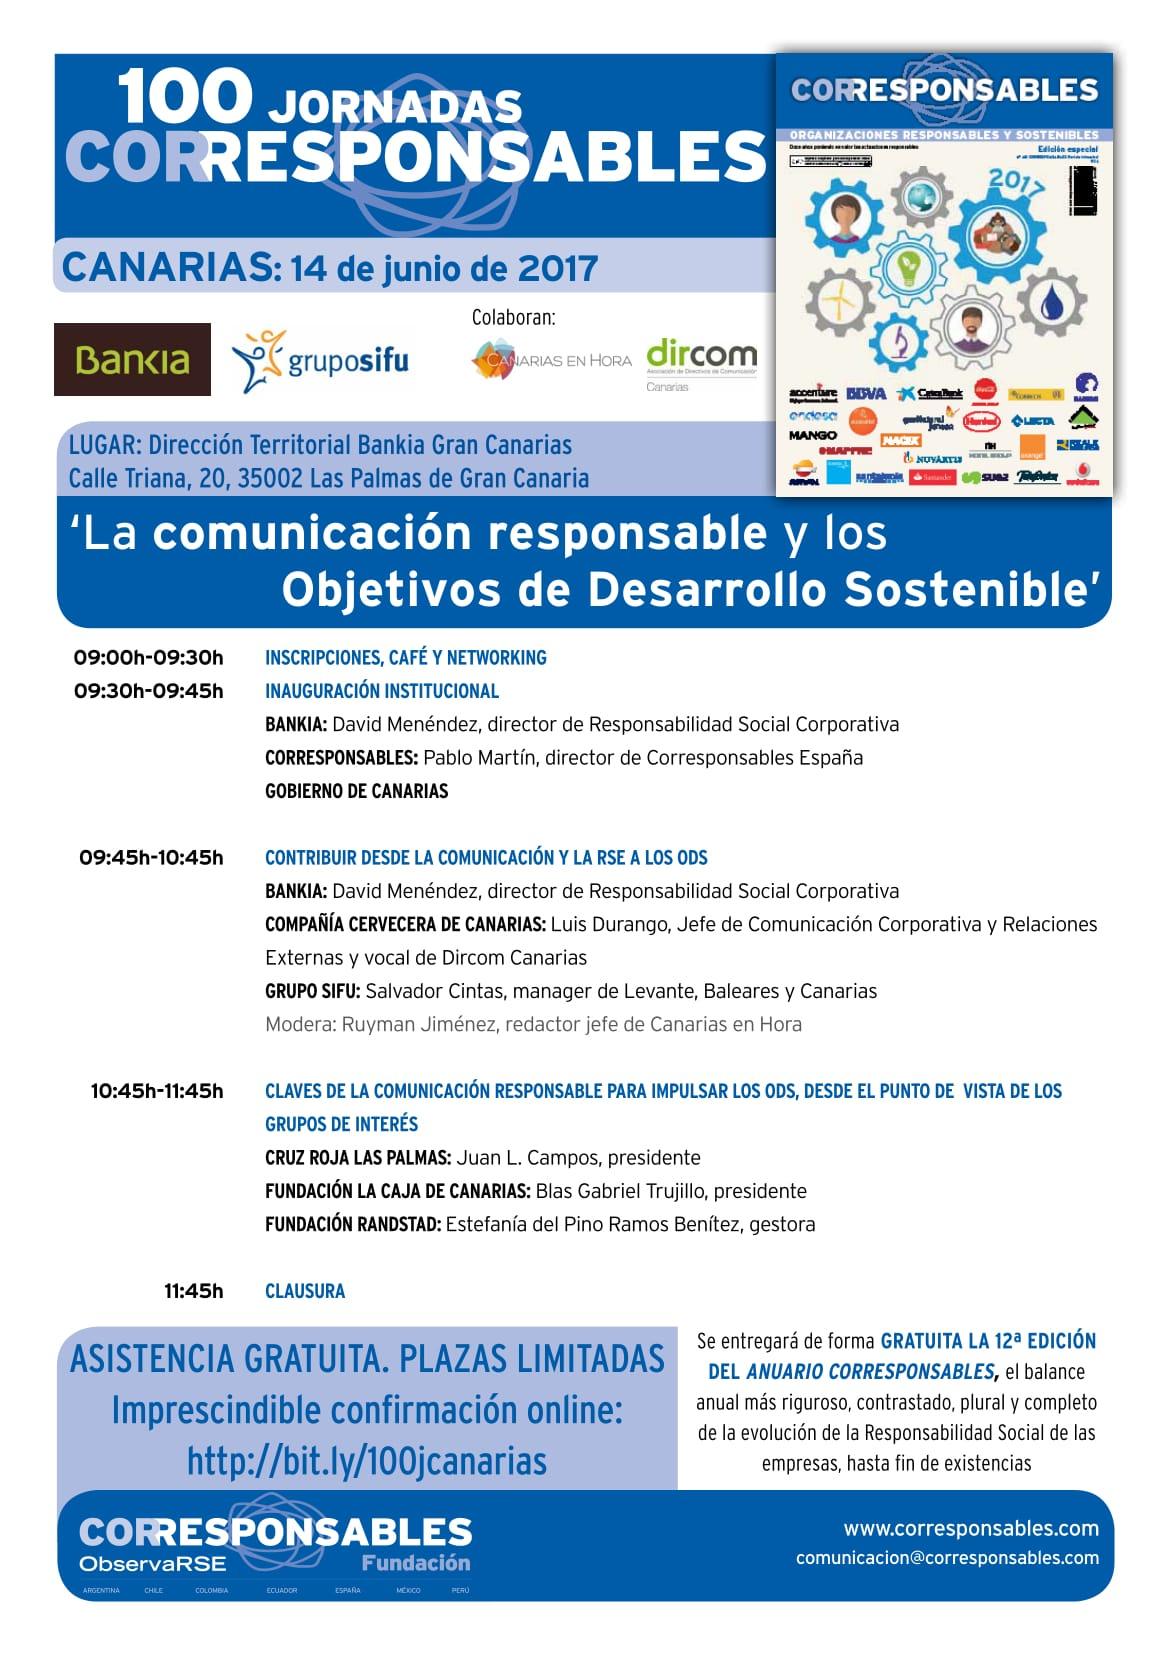 100JORNADA_ANUARIO2017_CANARIAS-1 (1)